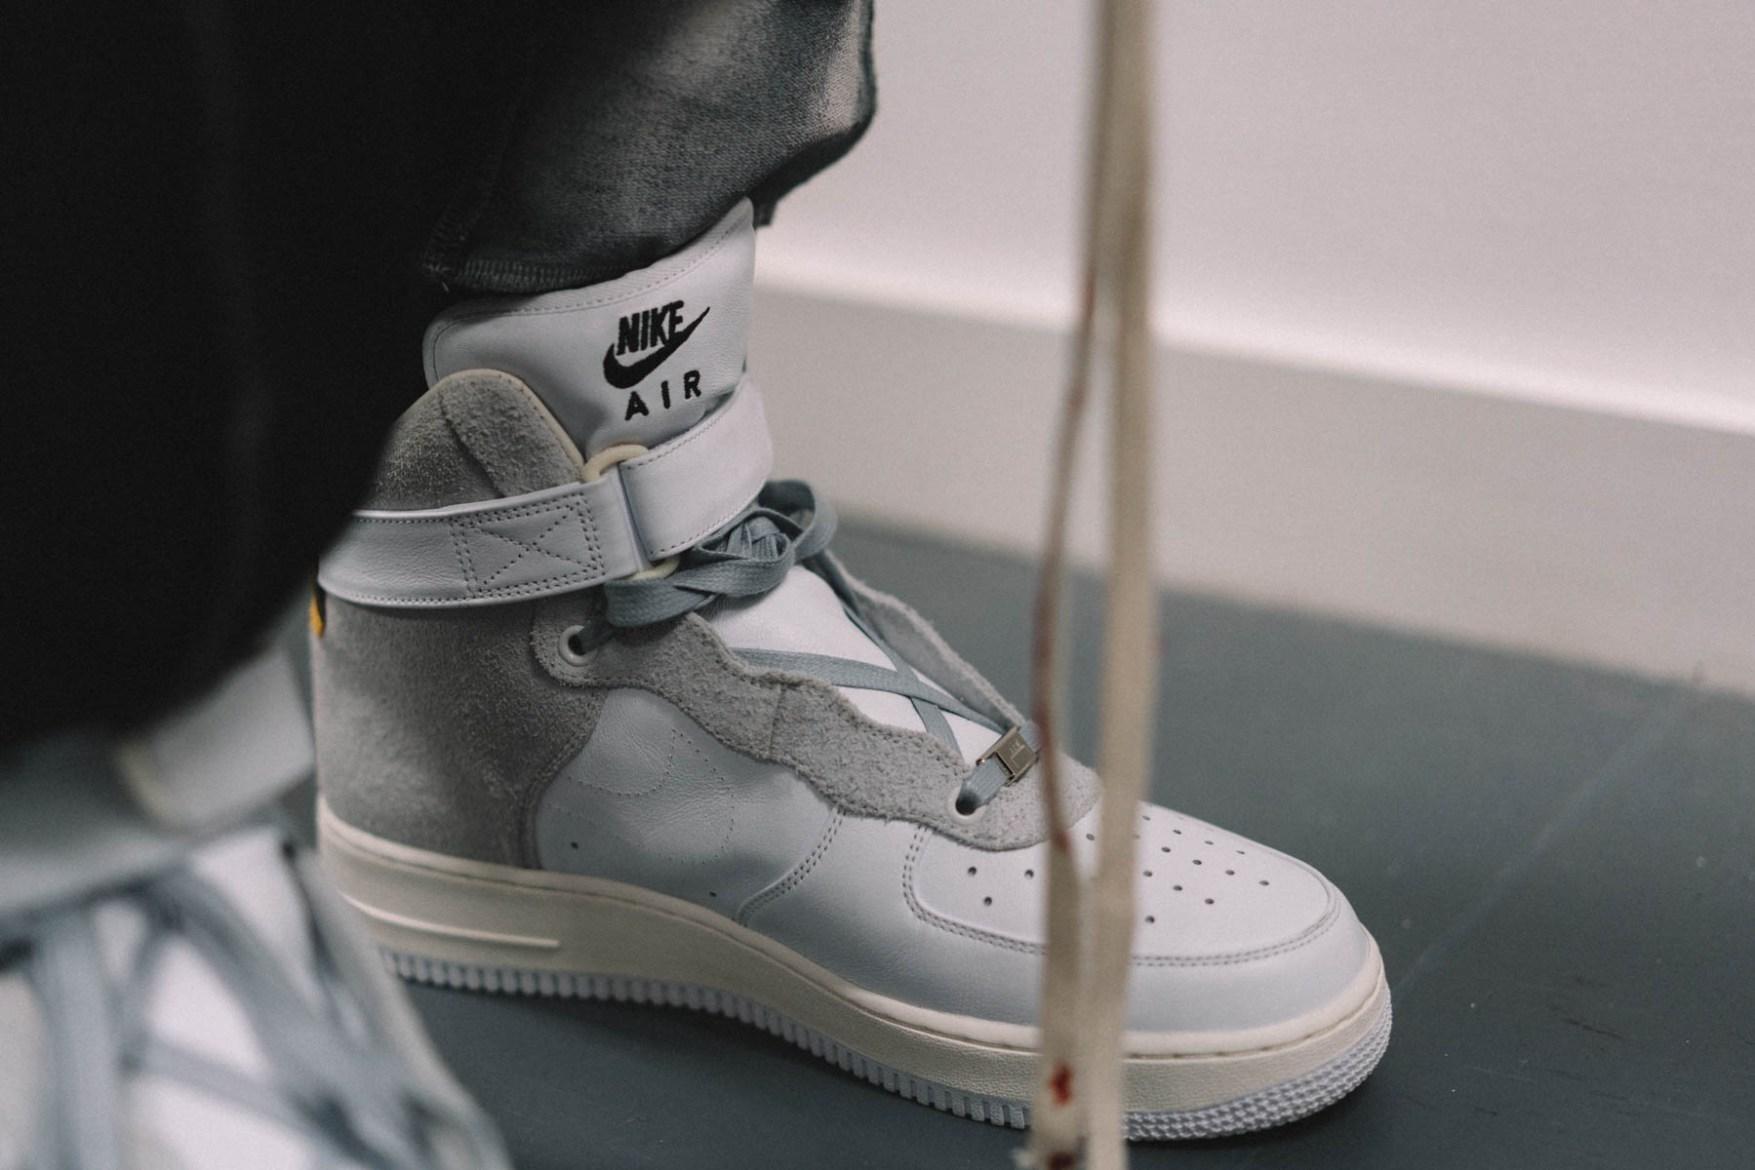 75d29c0586fcb6 A-COLD-WALL  x NikeLab Air Force 1 Custom Bespoke Sneaker .